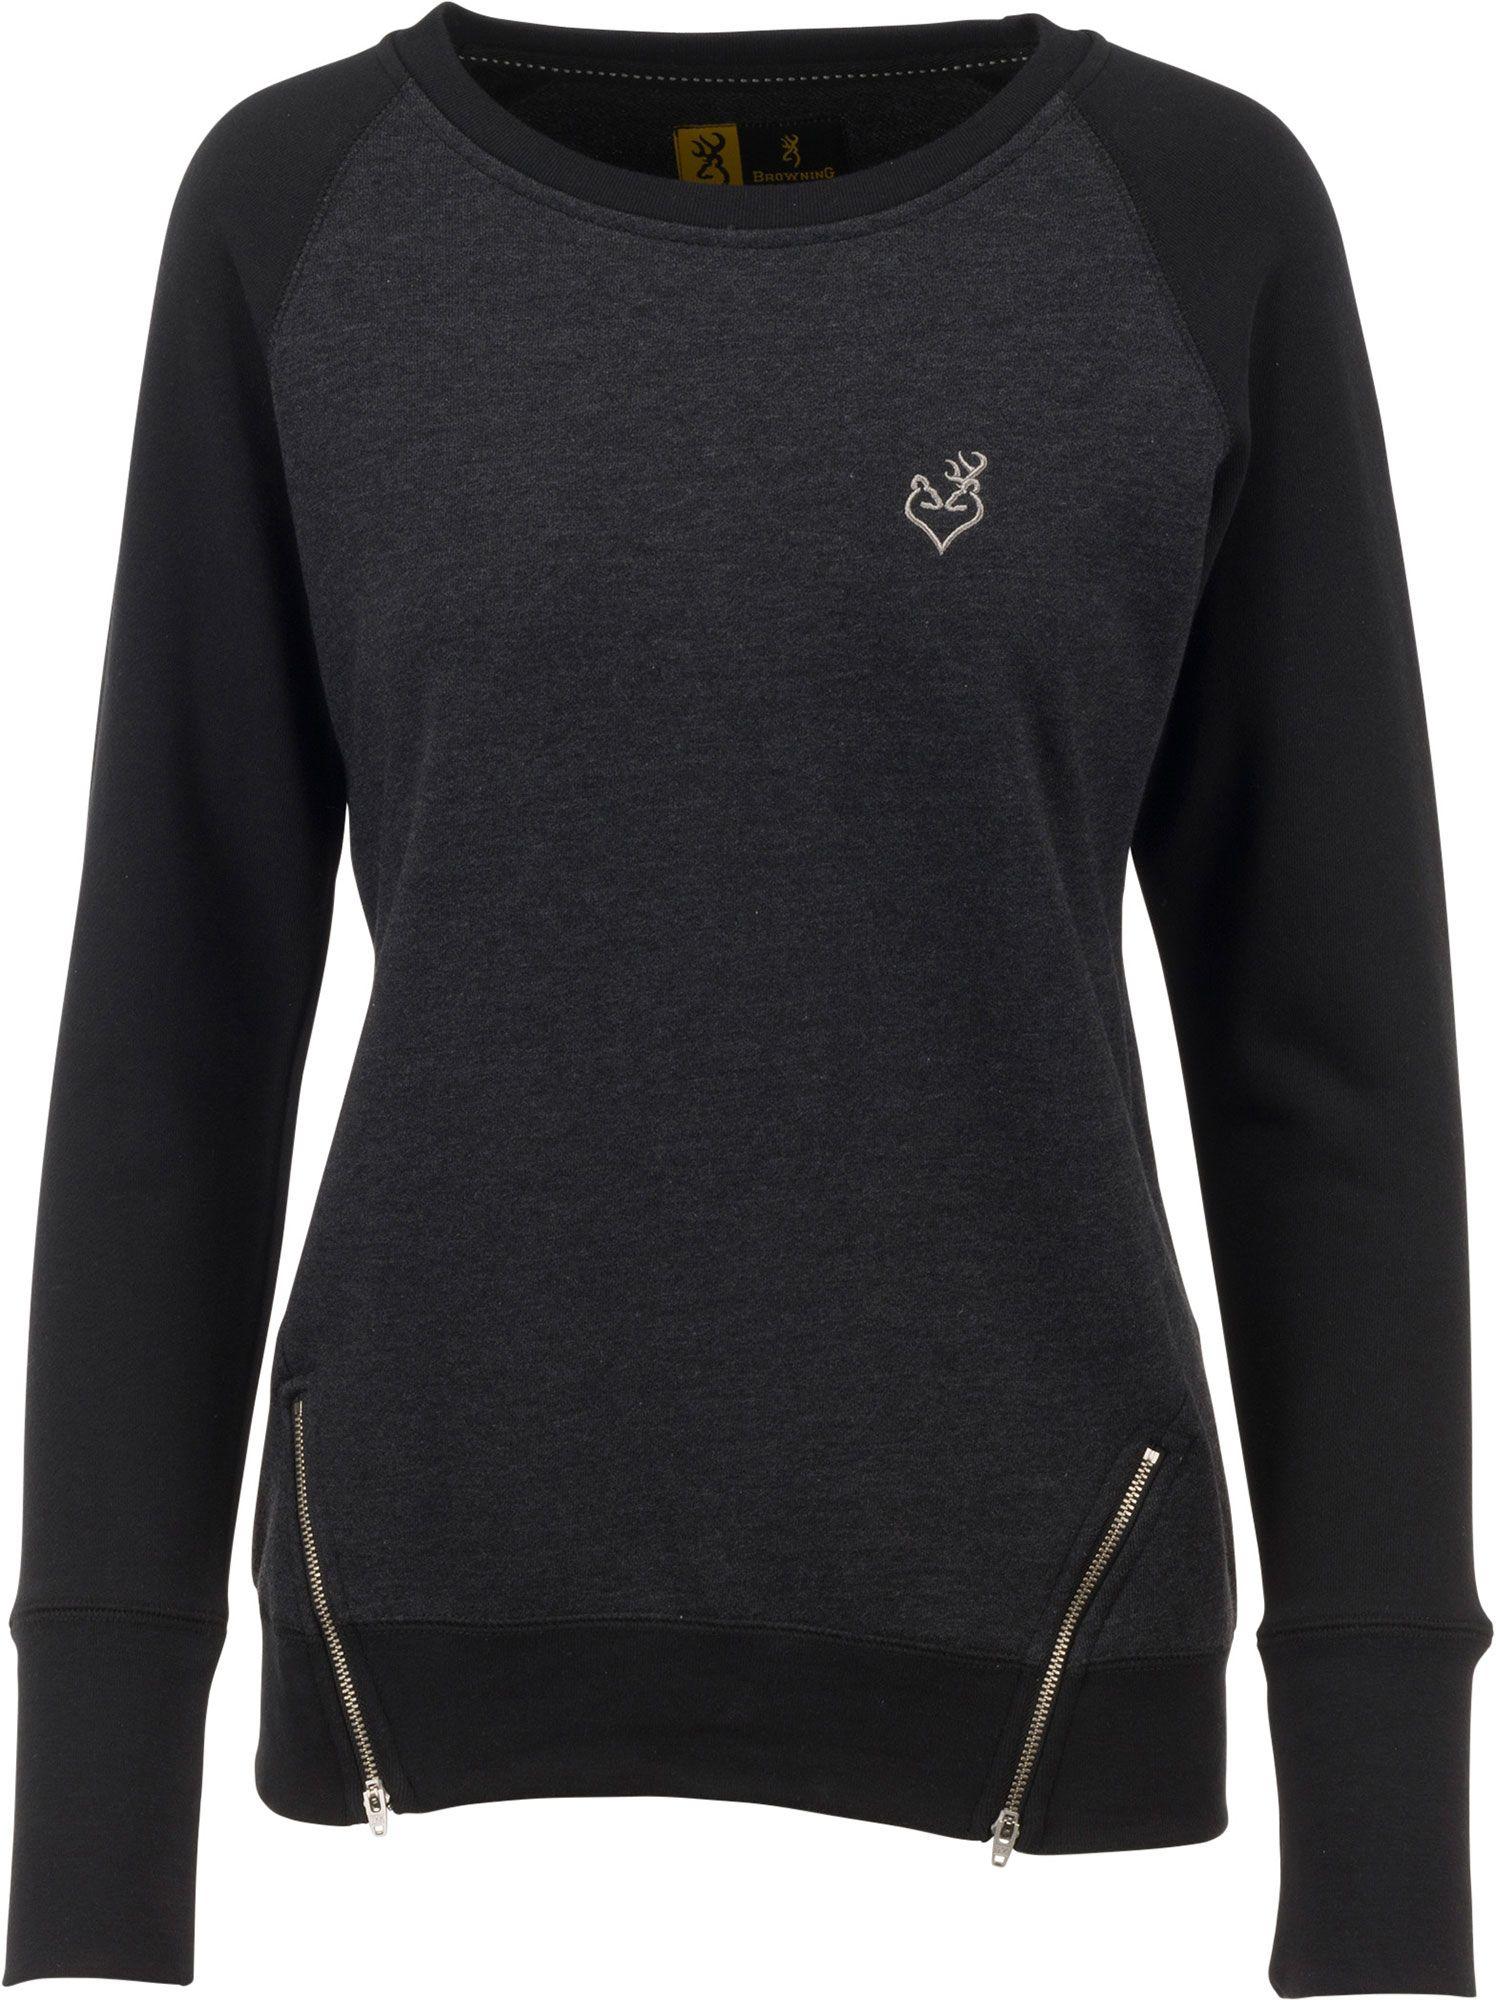 Browning Women's Cassia Sweatshirt, Size: Medium, Black thumbnail